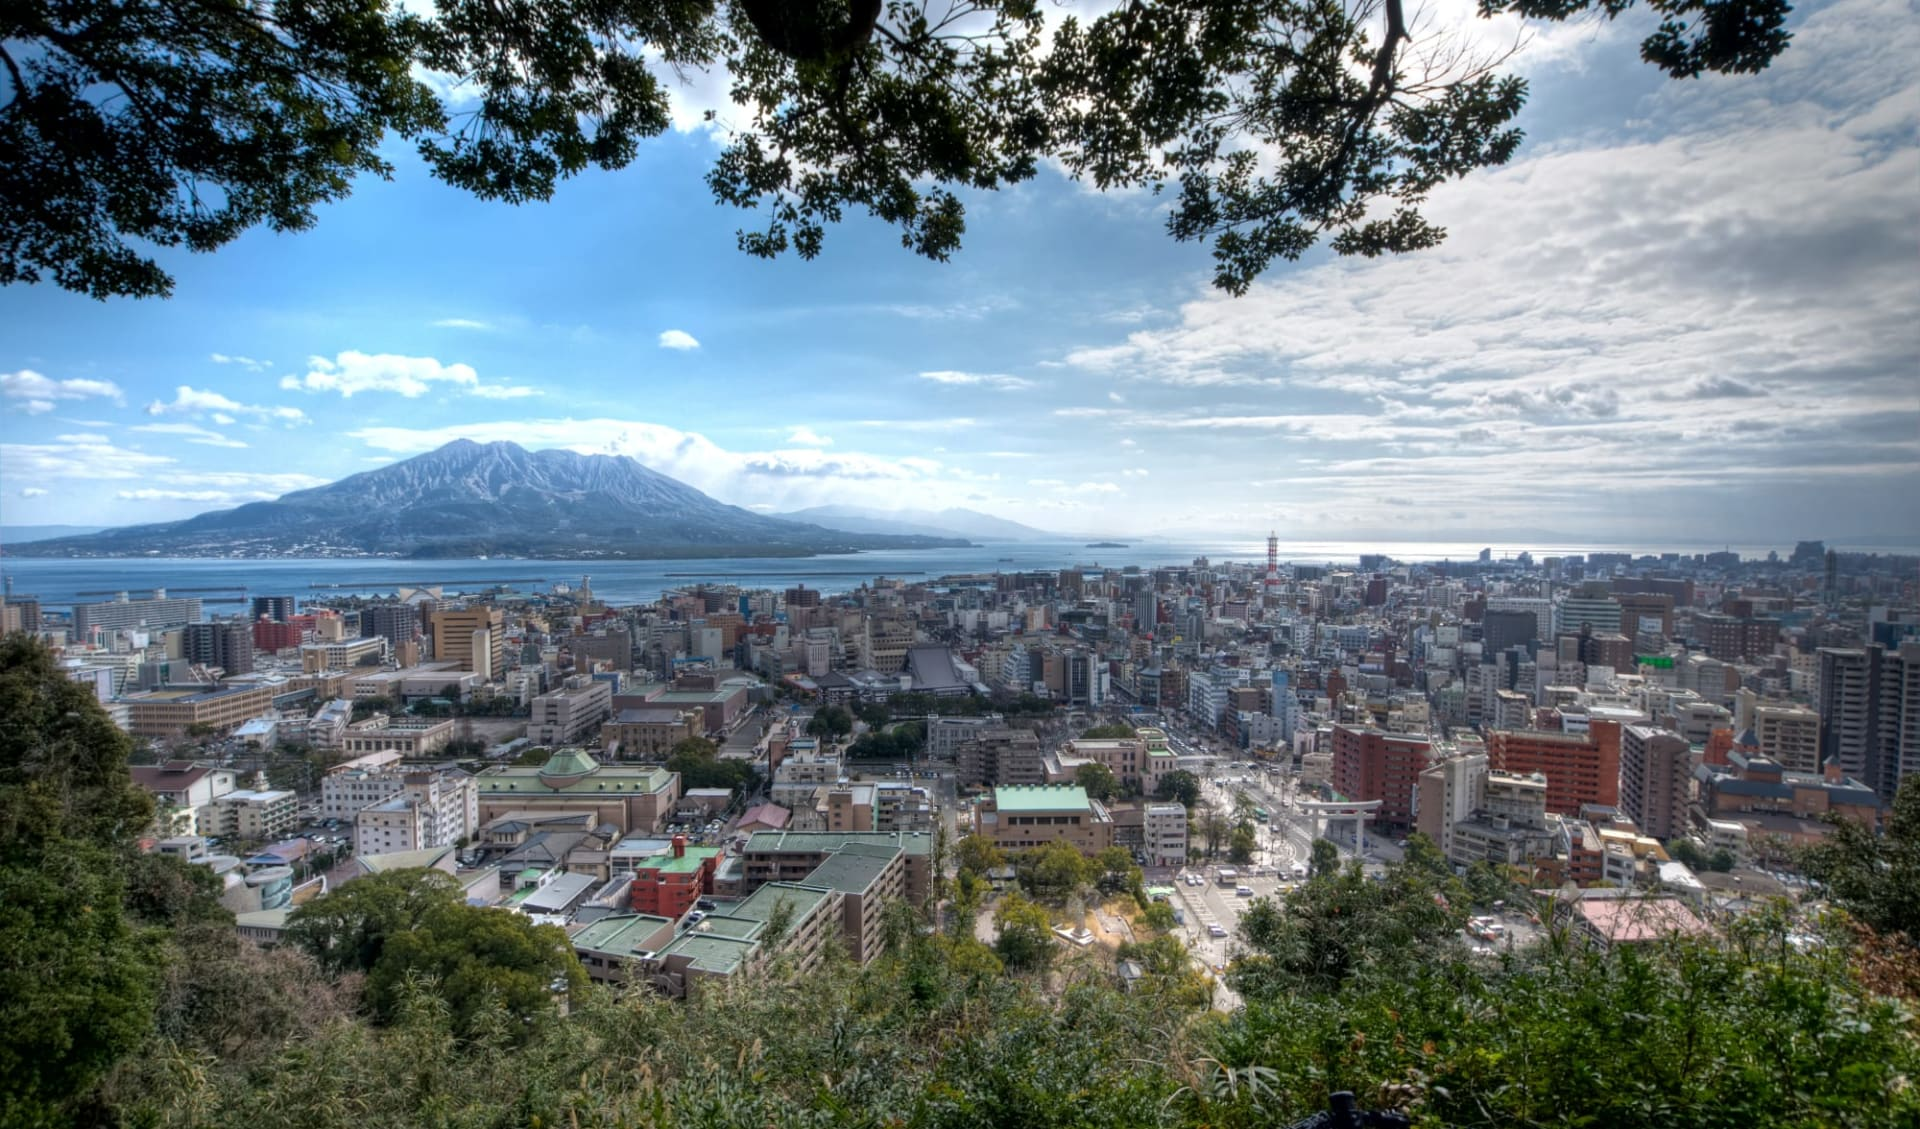 Höhepunkte Japans mit Verlängerung ab Tokio: Kagoshima city with Sakurajima Volcano